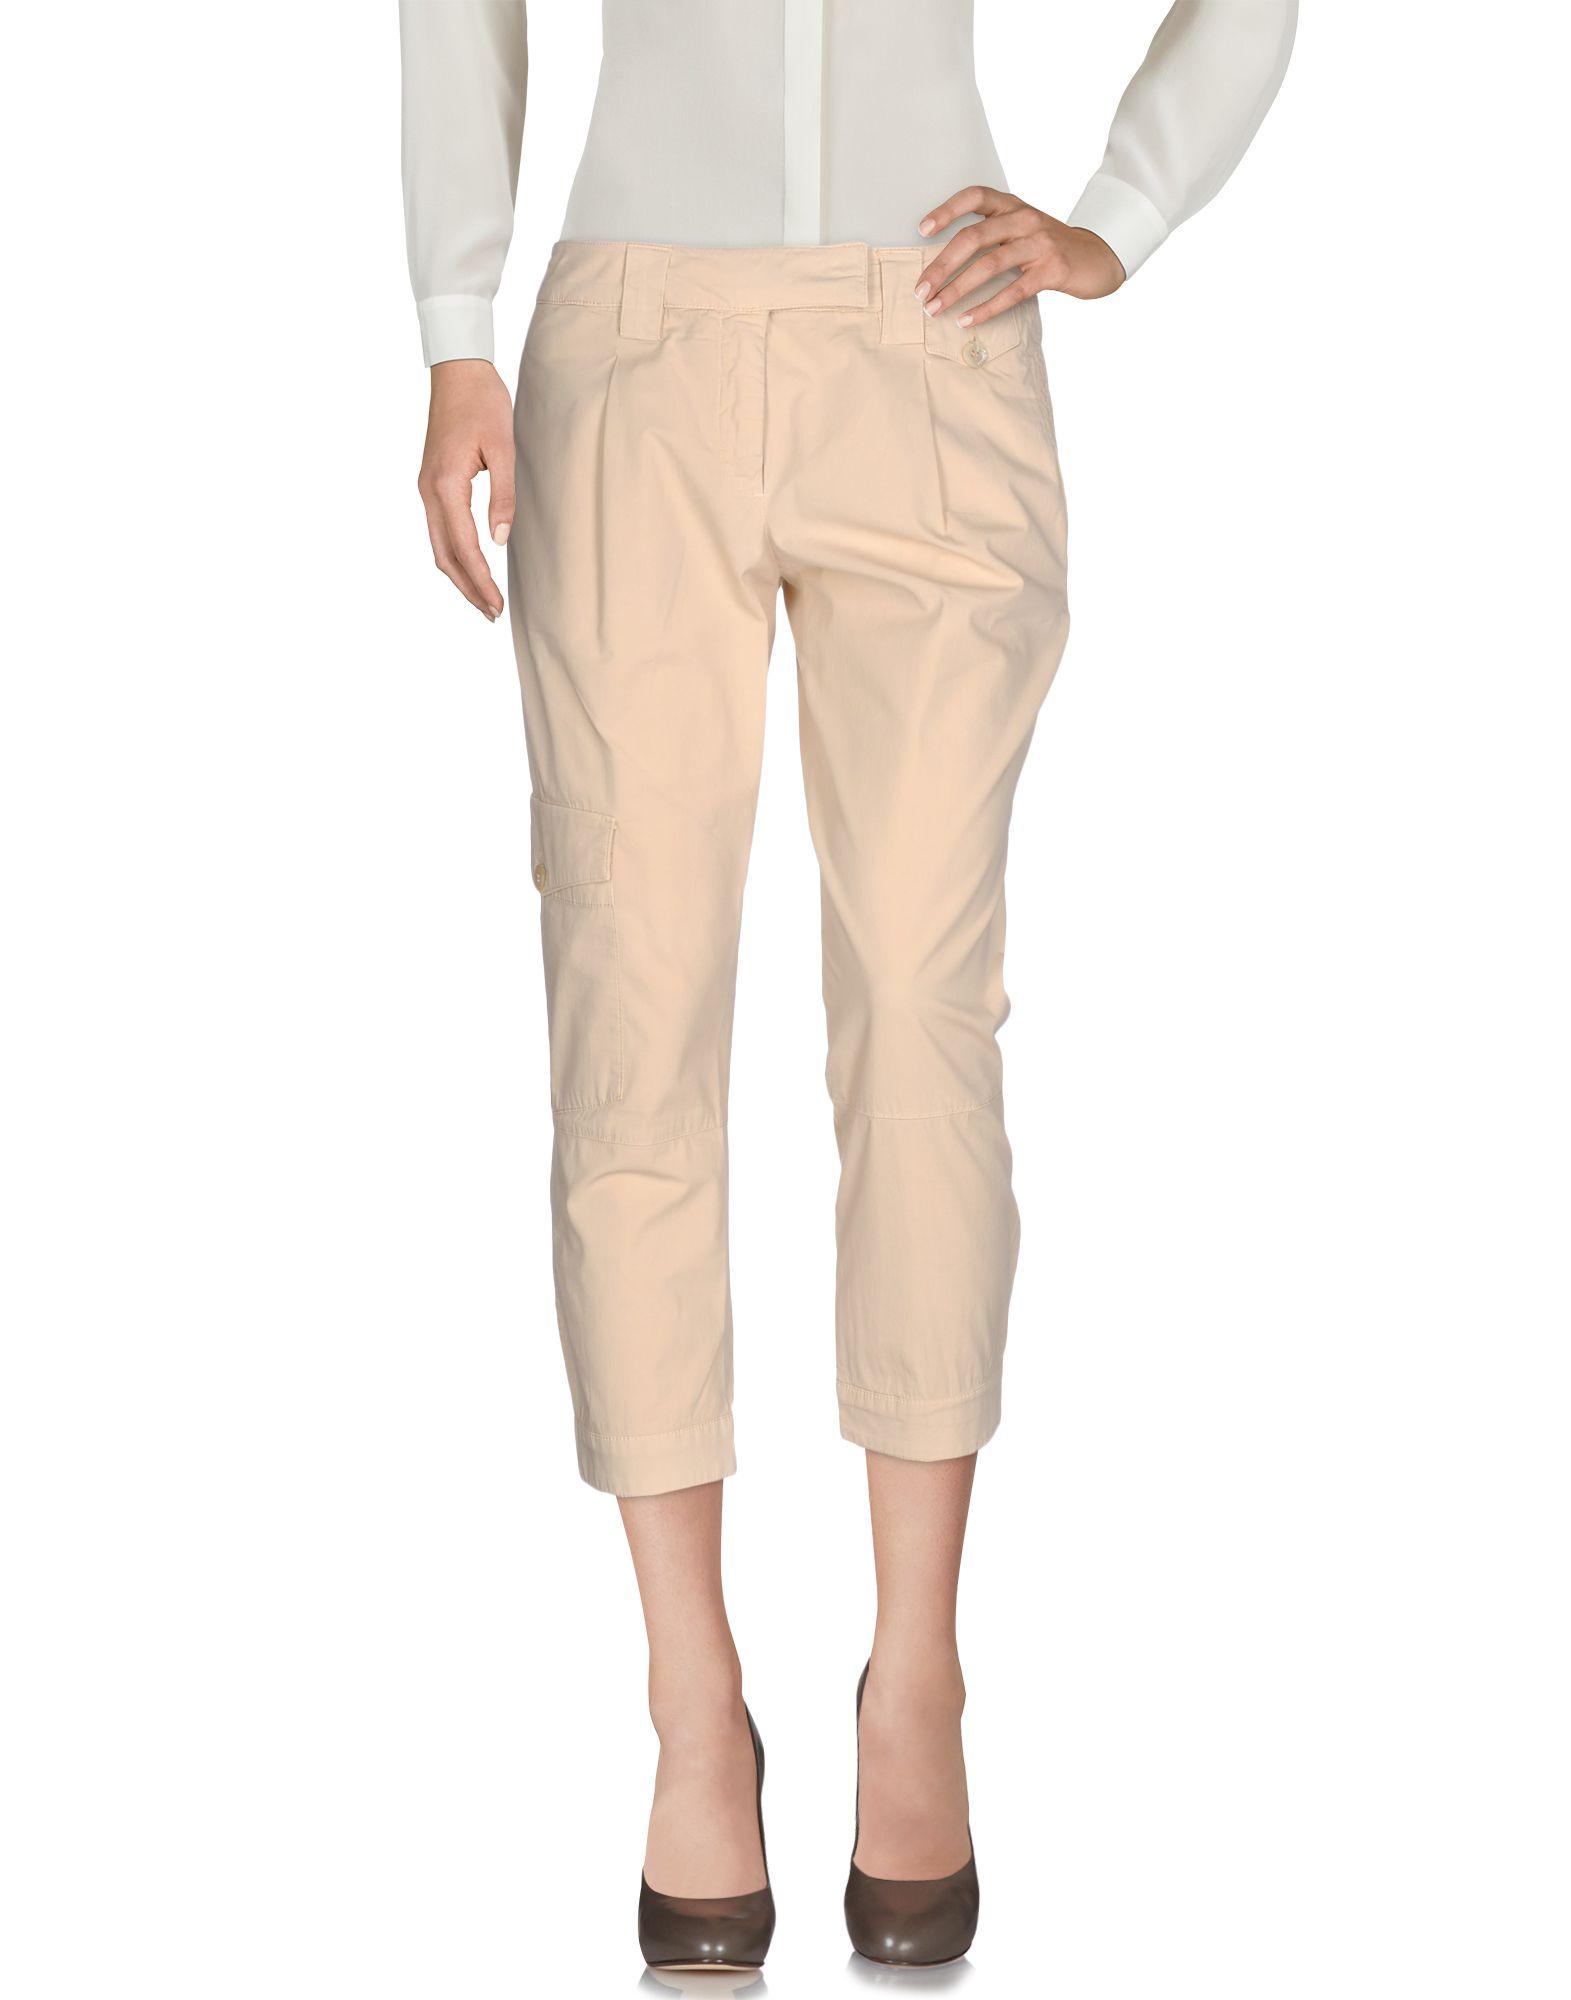 Pantalone Siviglia donna - 36941962QB 36941962QB 36941962QB c3c